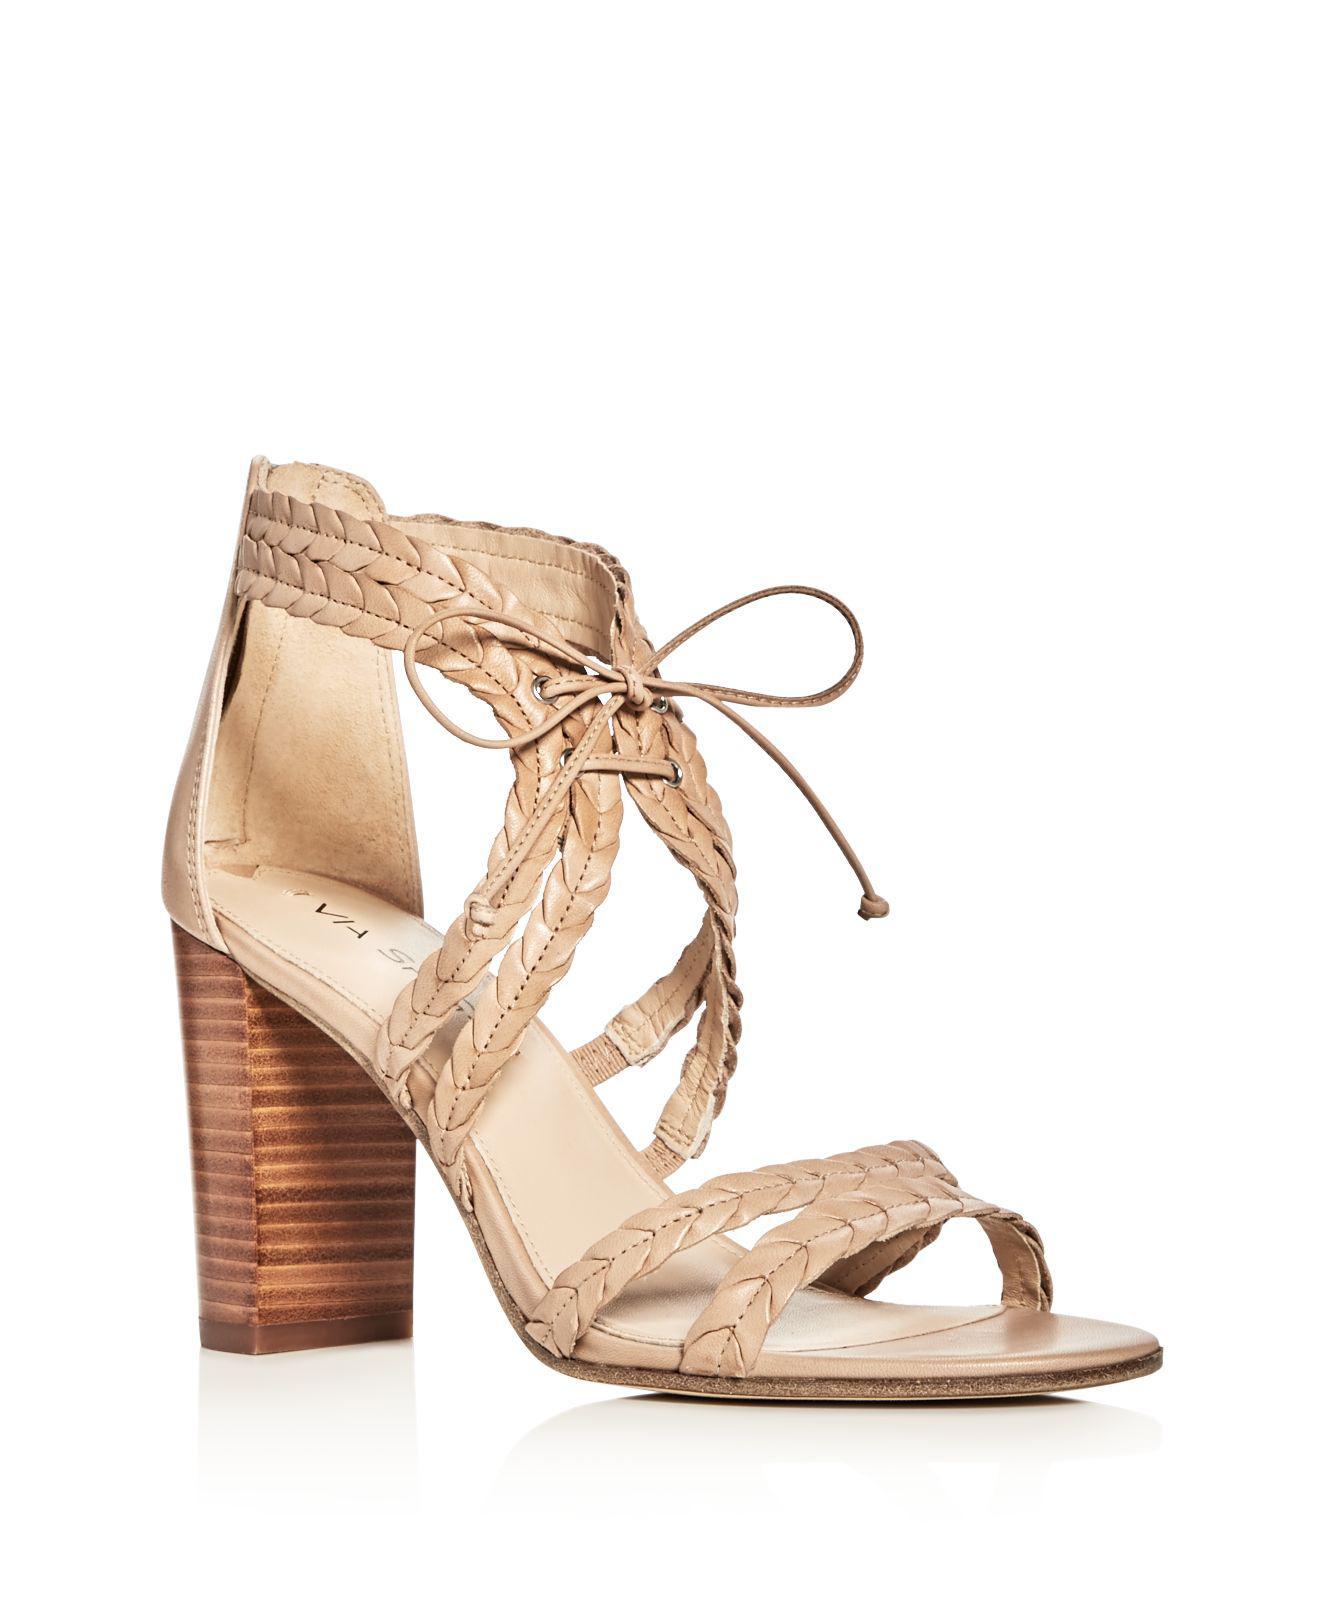 9df5ef85ca91 Via Spiga Gardenia Lace Up High Heel Sandals - Lyst